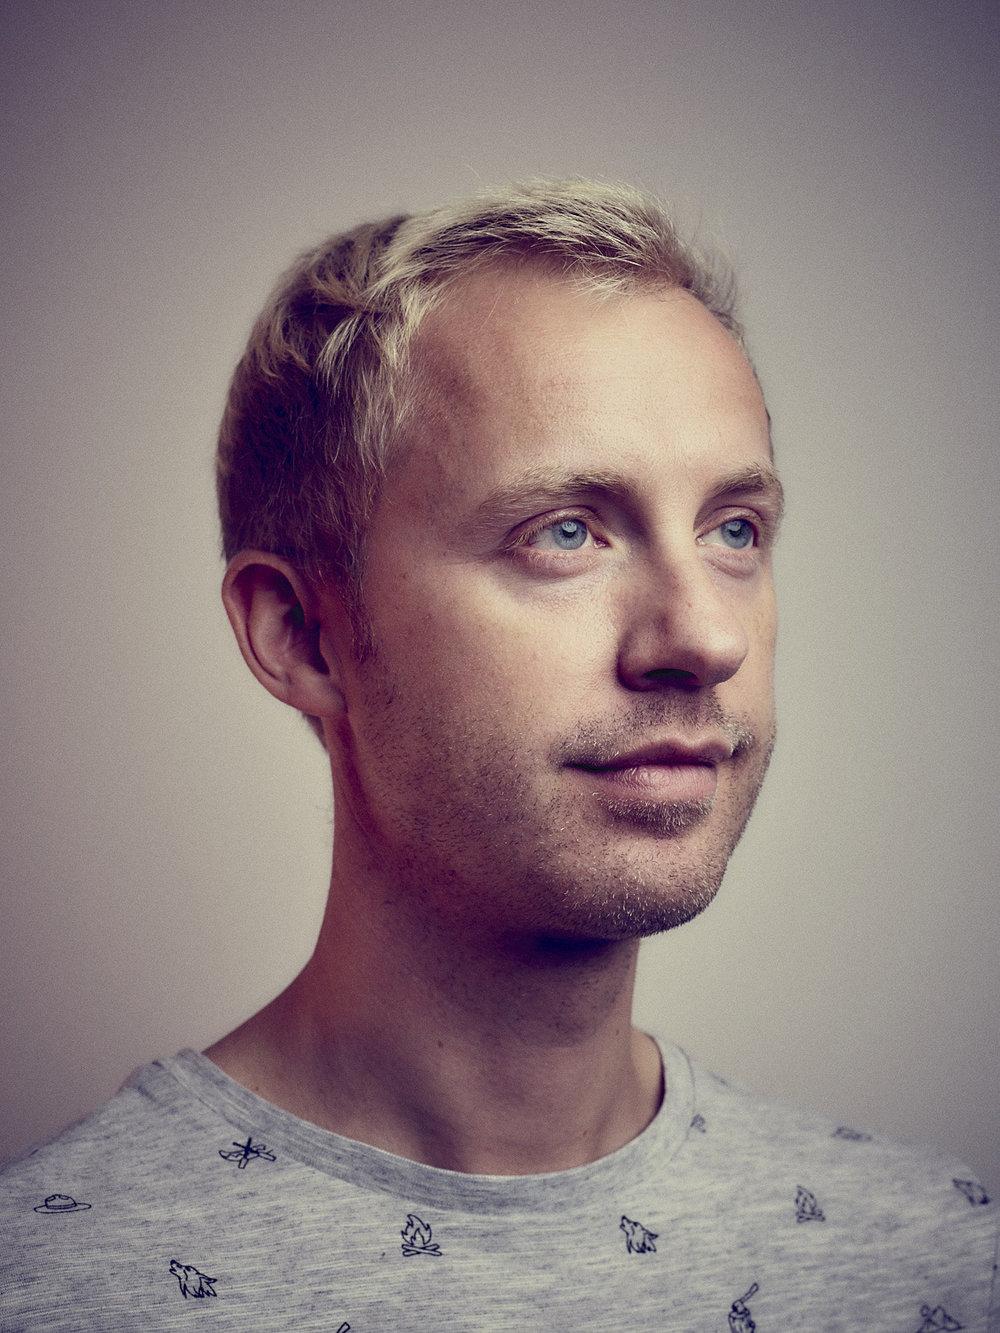 Matthew Joseph - portrait of man with blonde hair